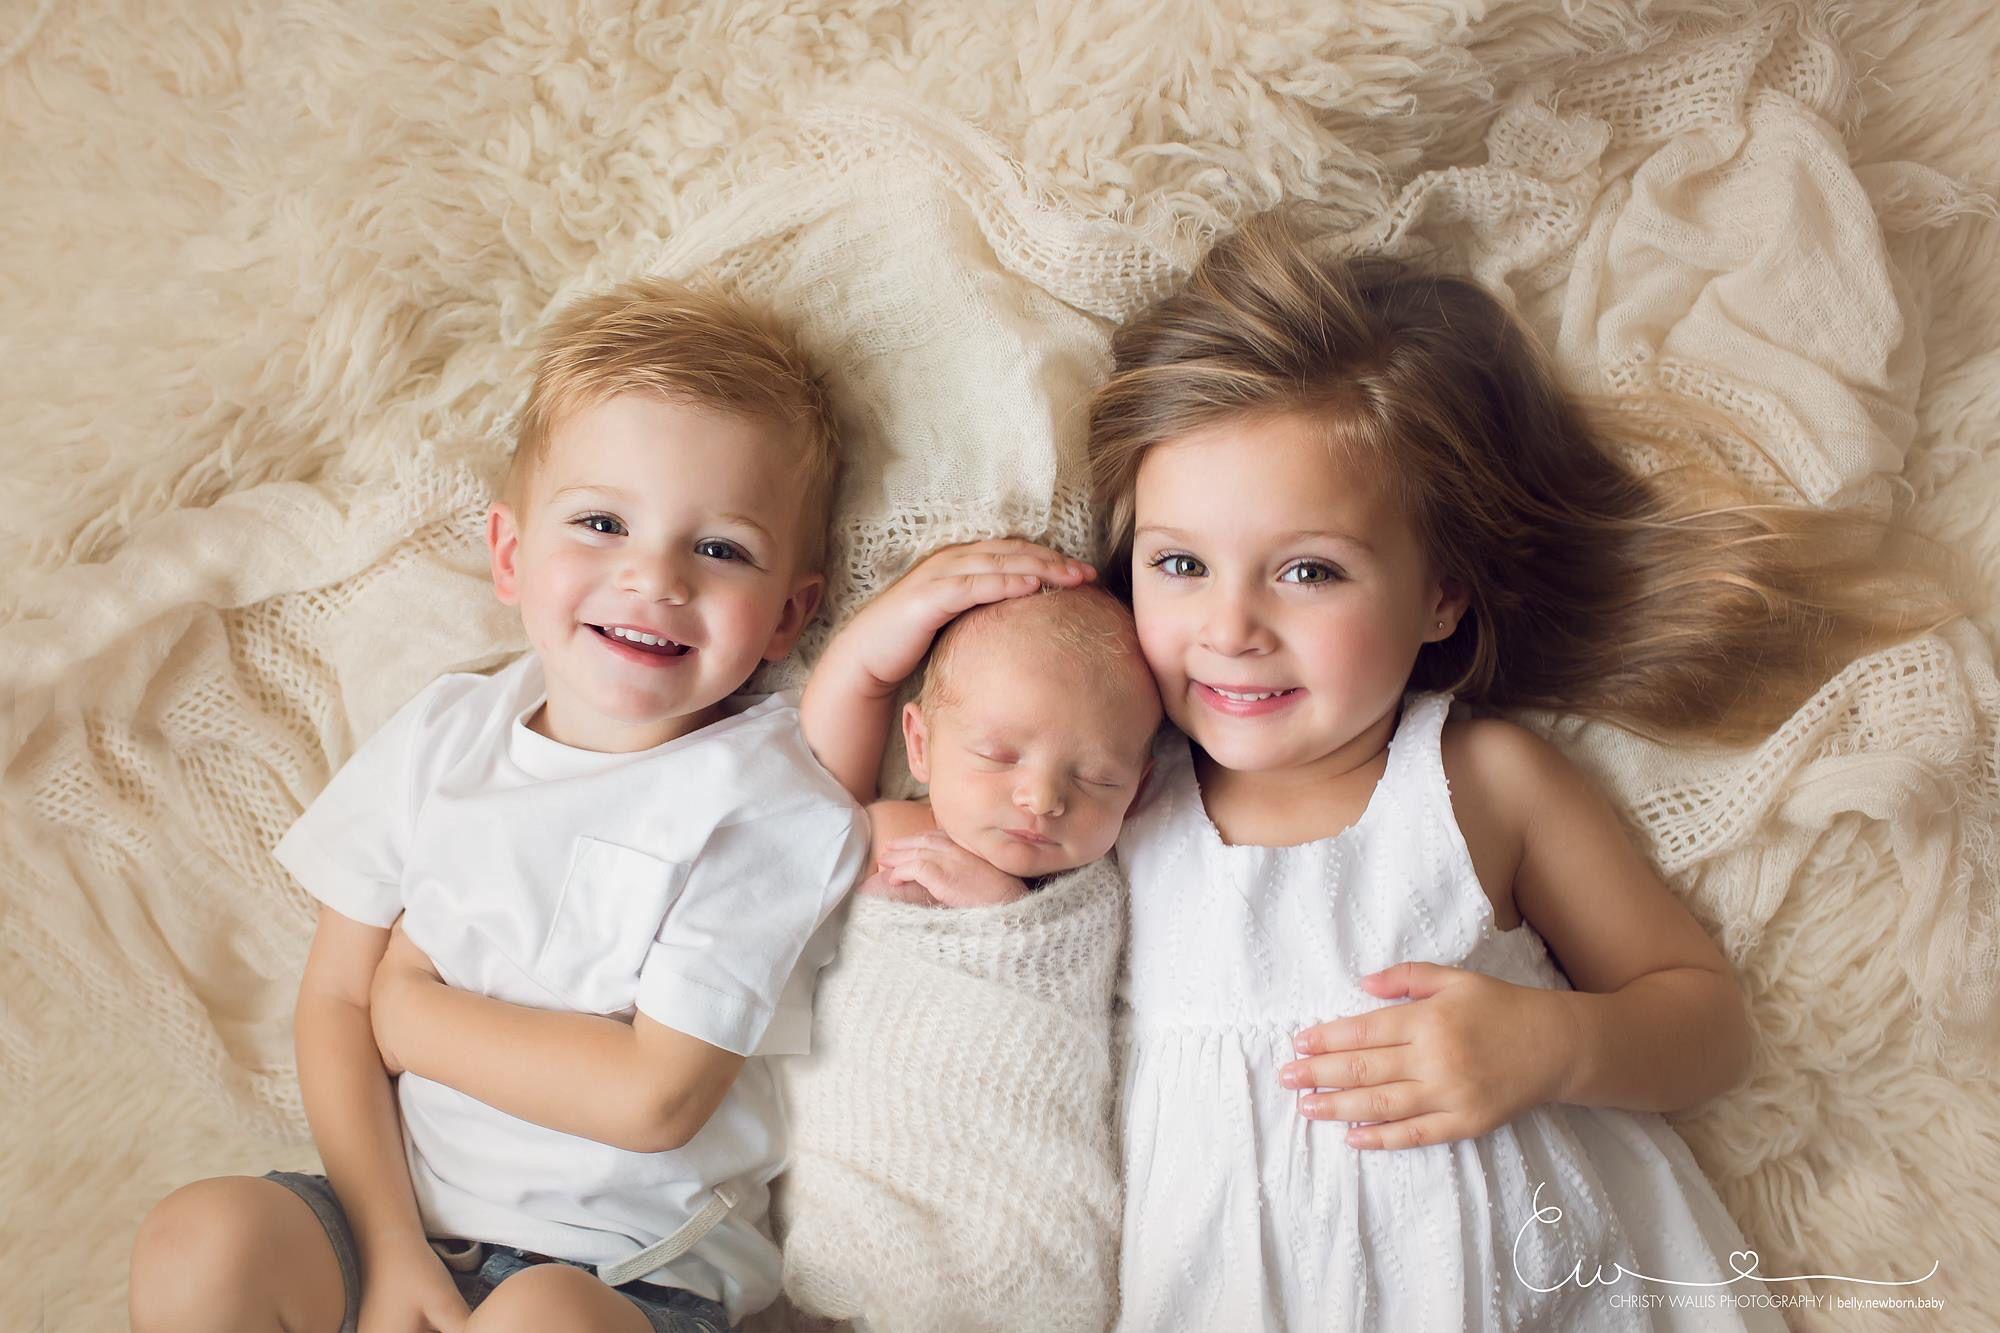 3 under 4 three under four siblings three kids newborn photo newborn photos siblings sibling photos sibling newborn photo new baby